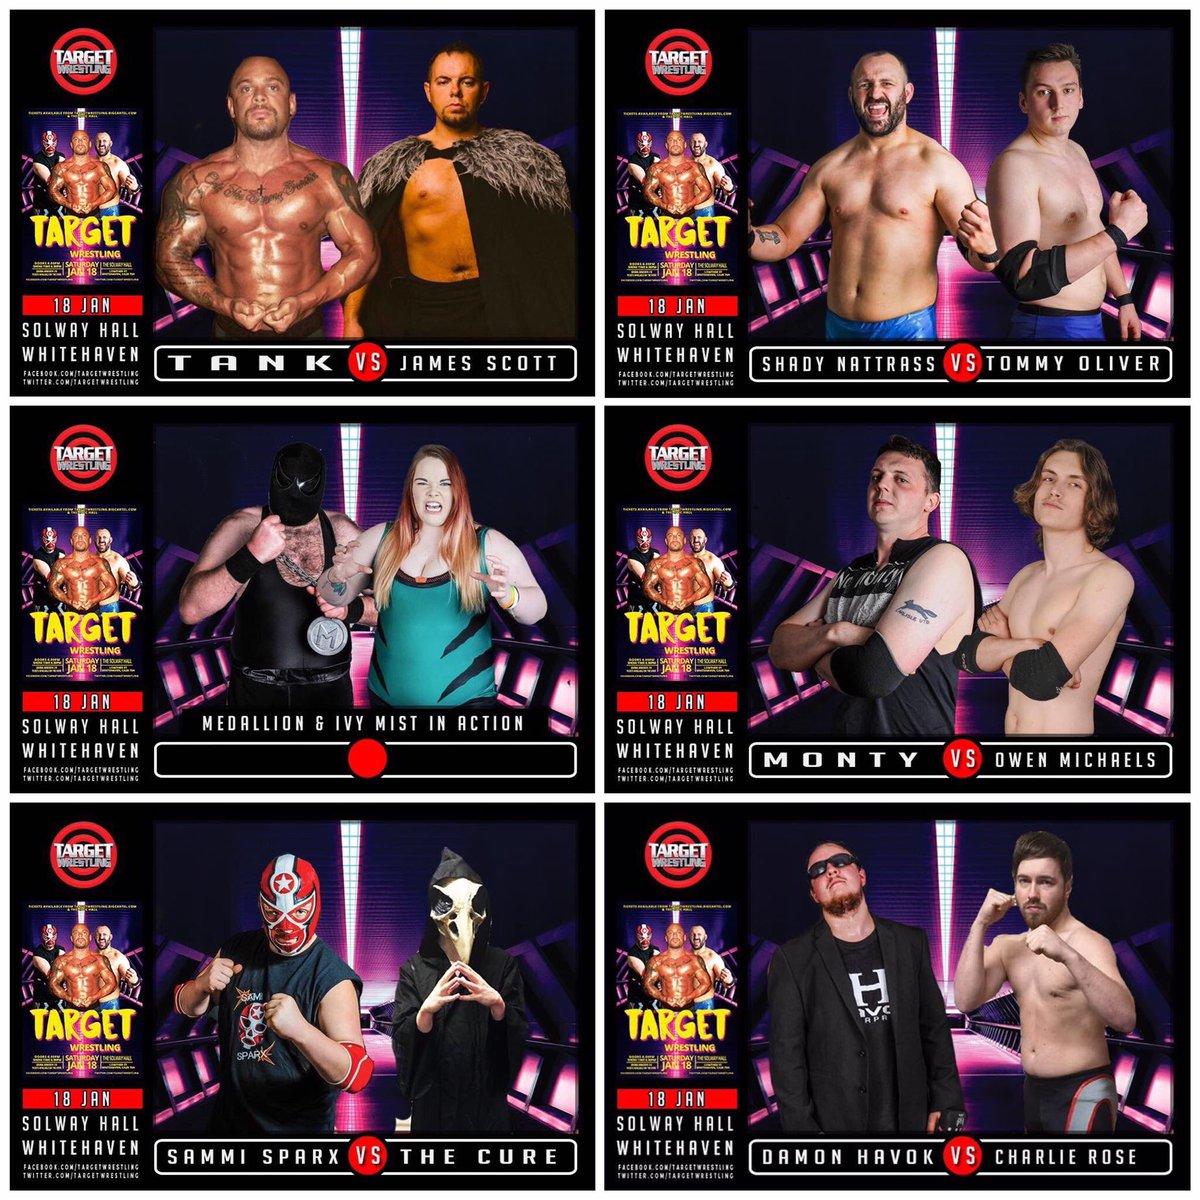 RT @john_nattrass: Tomorrow night! #whitehaven.#wrestling.#westcumbria https://t.co/Ai57F6Zoy9